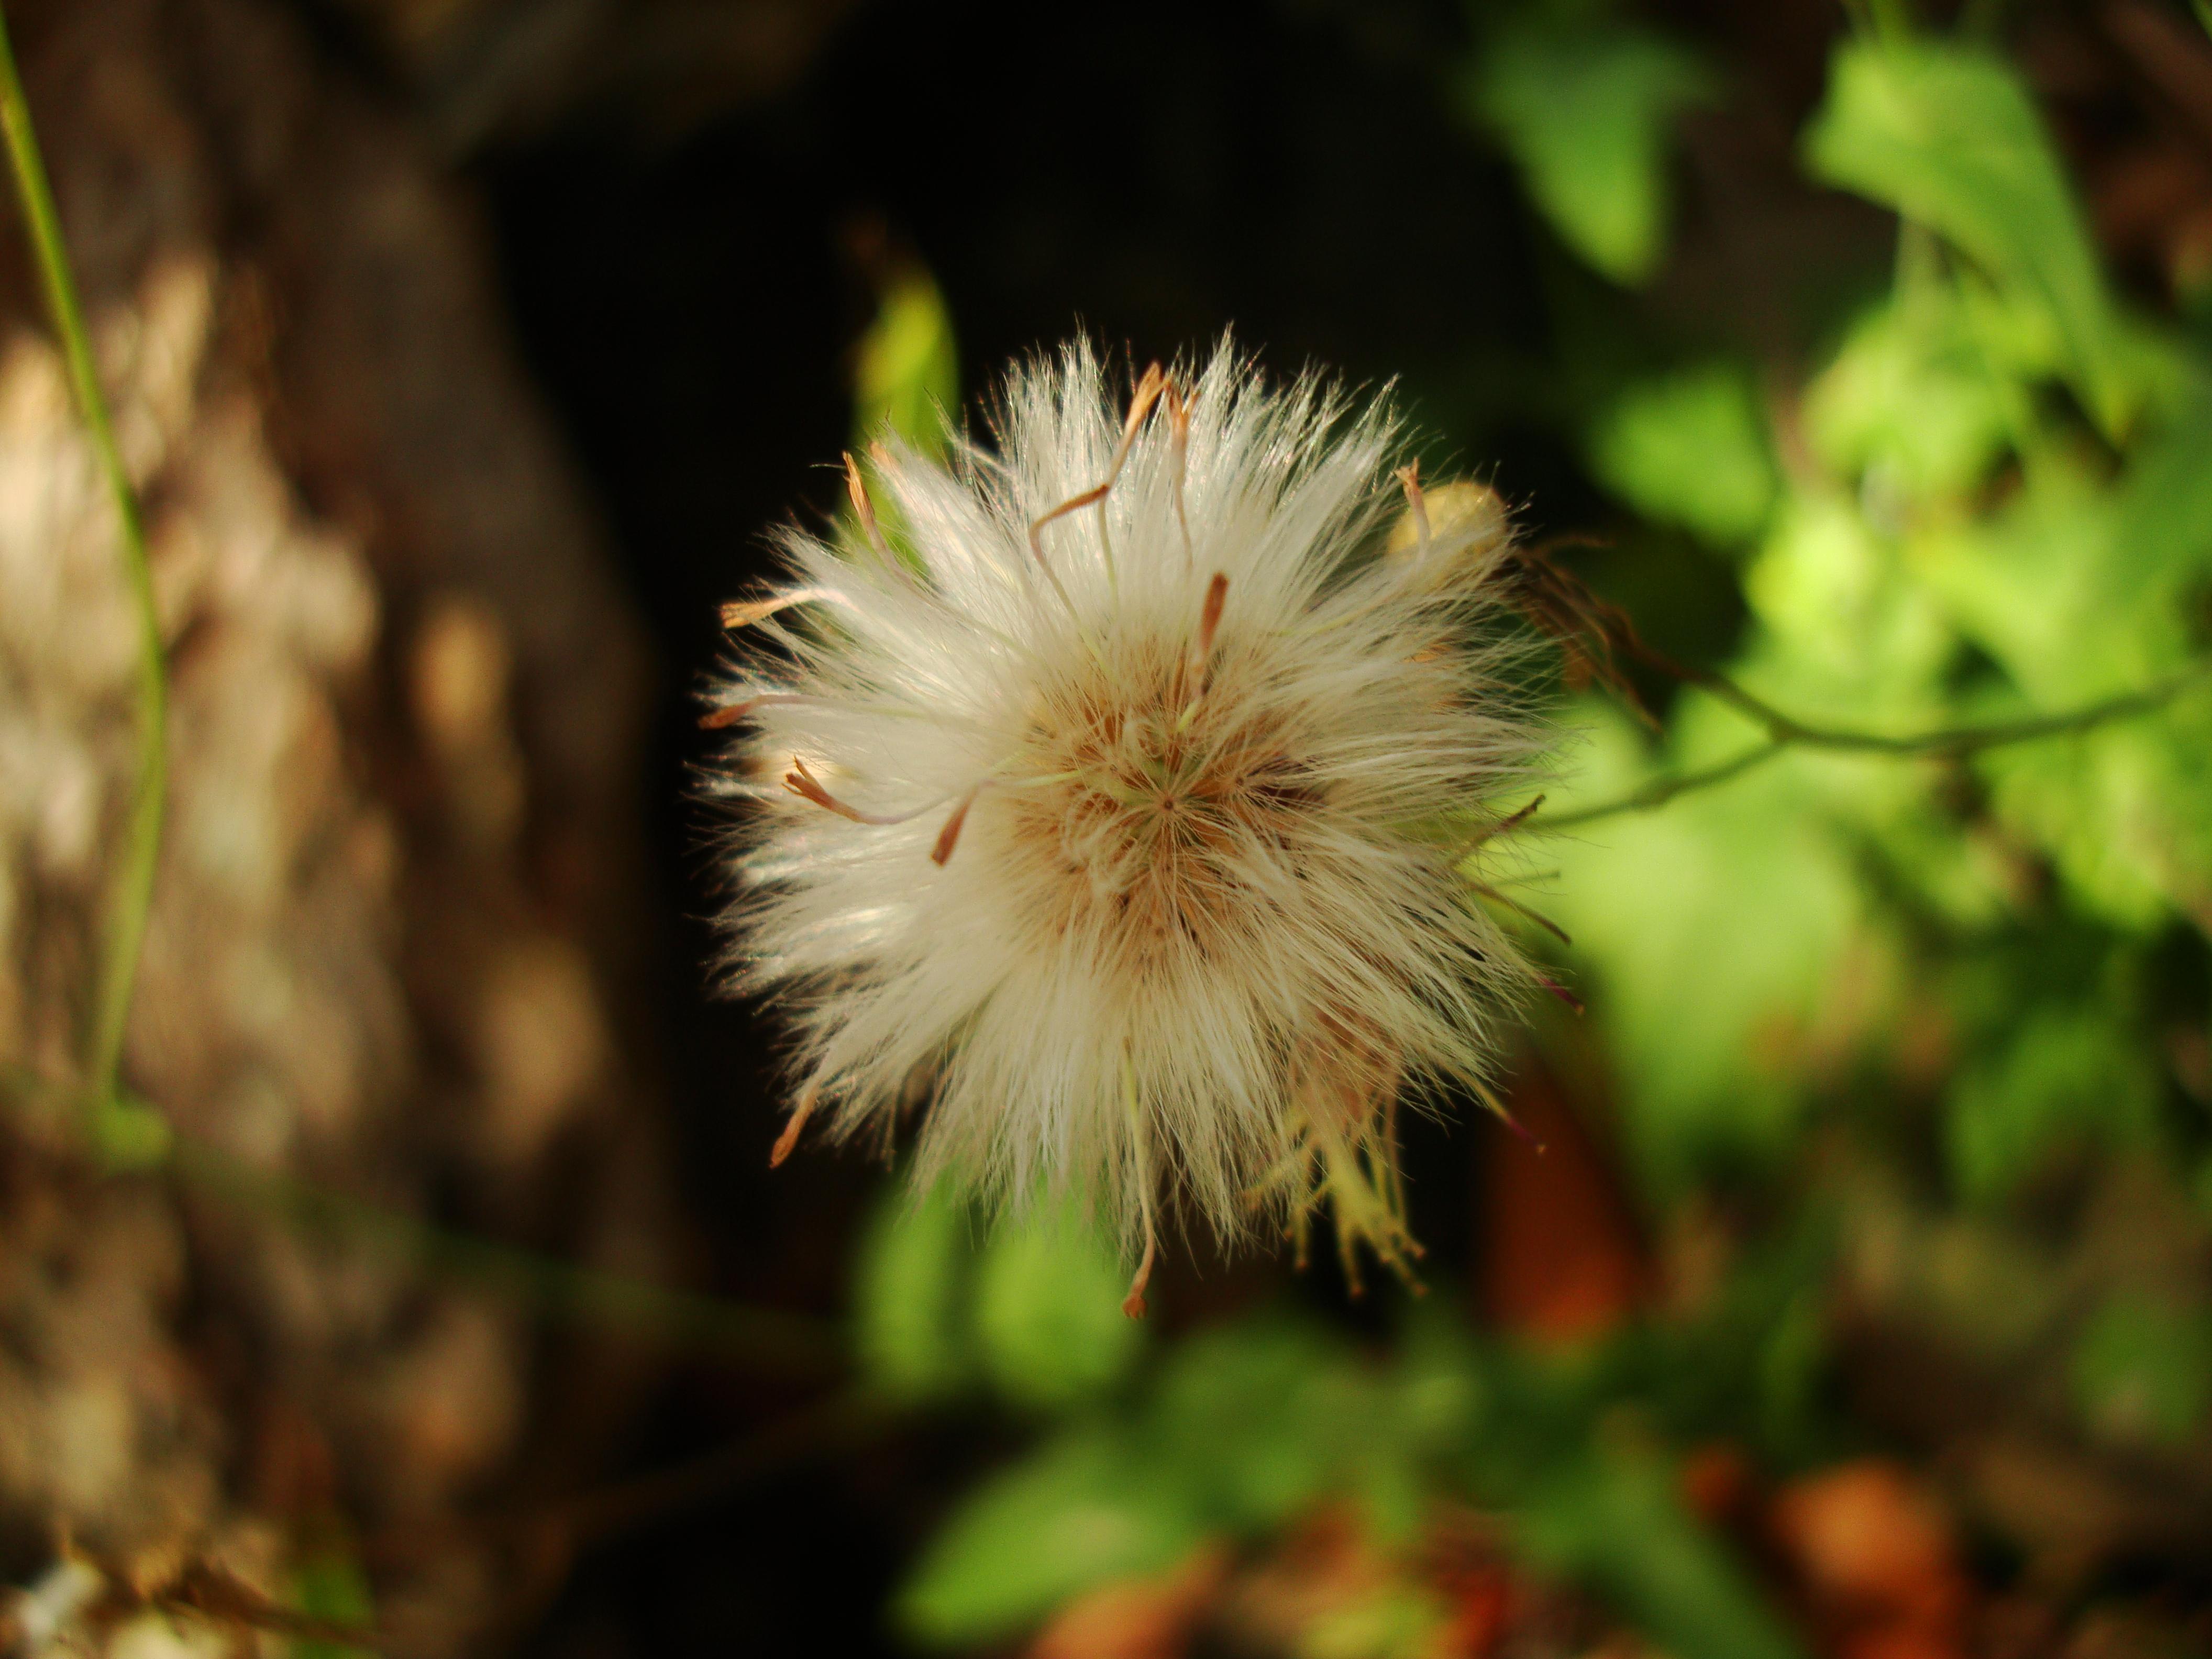 Tiny Flowers Daisy seeds Noosa Australia 06